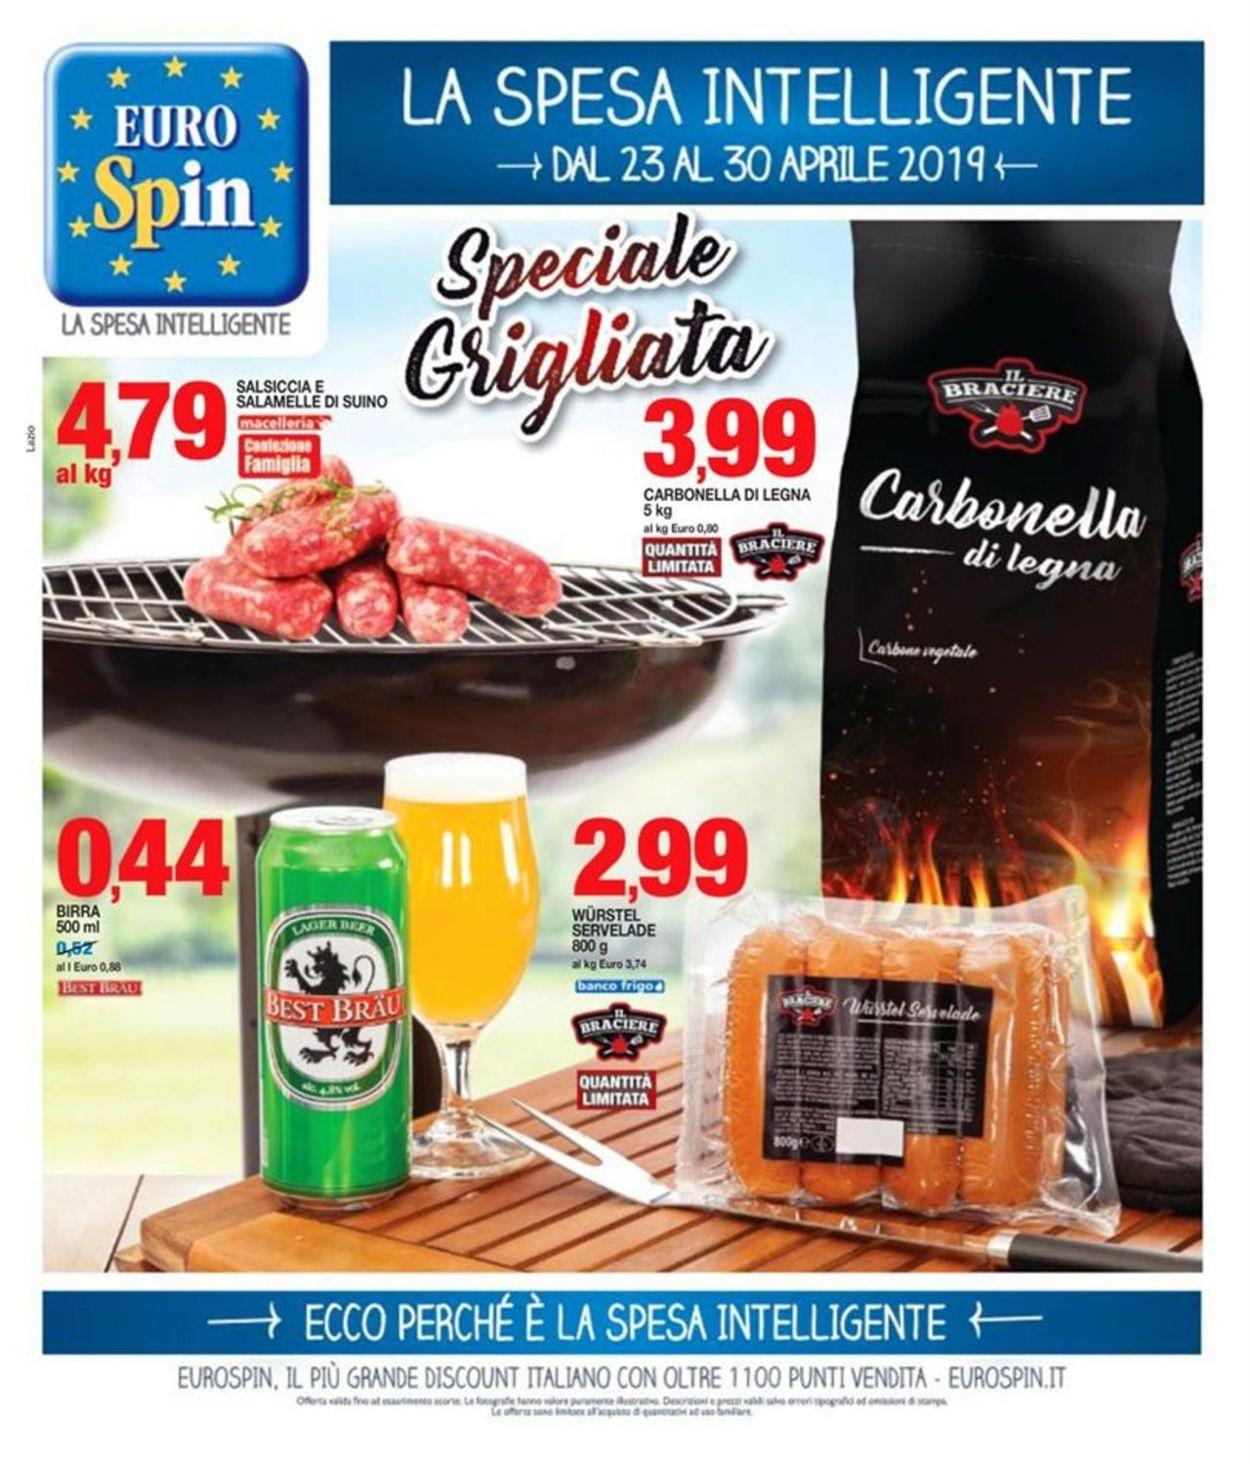 Volantino EURO Spin - Offerte 23/04-30/04/2019